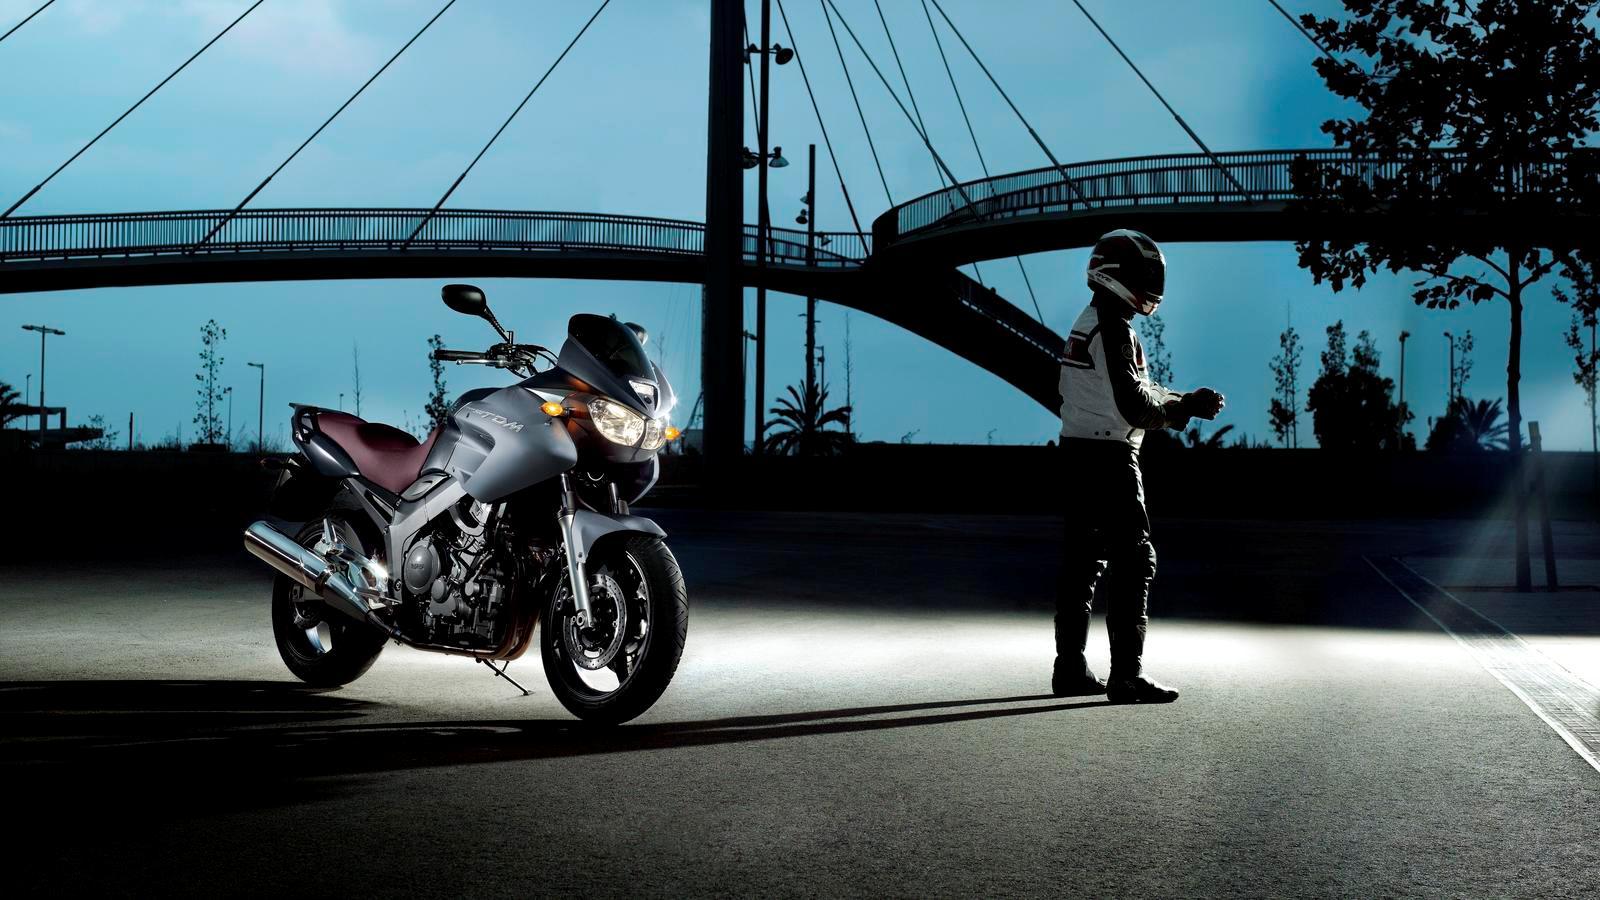 Мотоцикл yamaha road star silverado s 1700 2011 фото